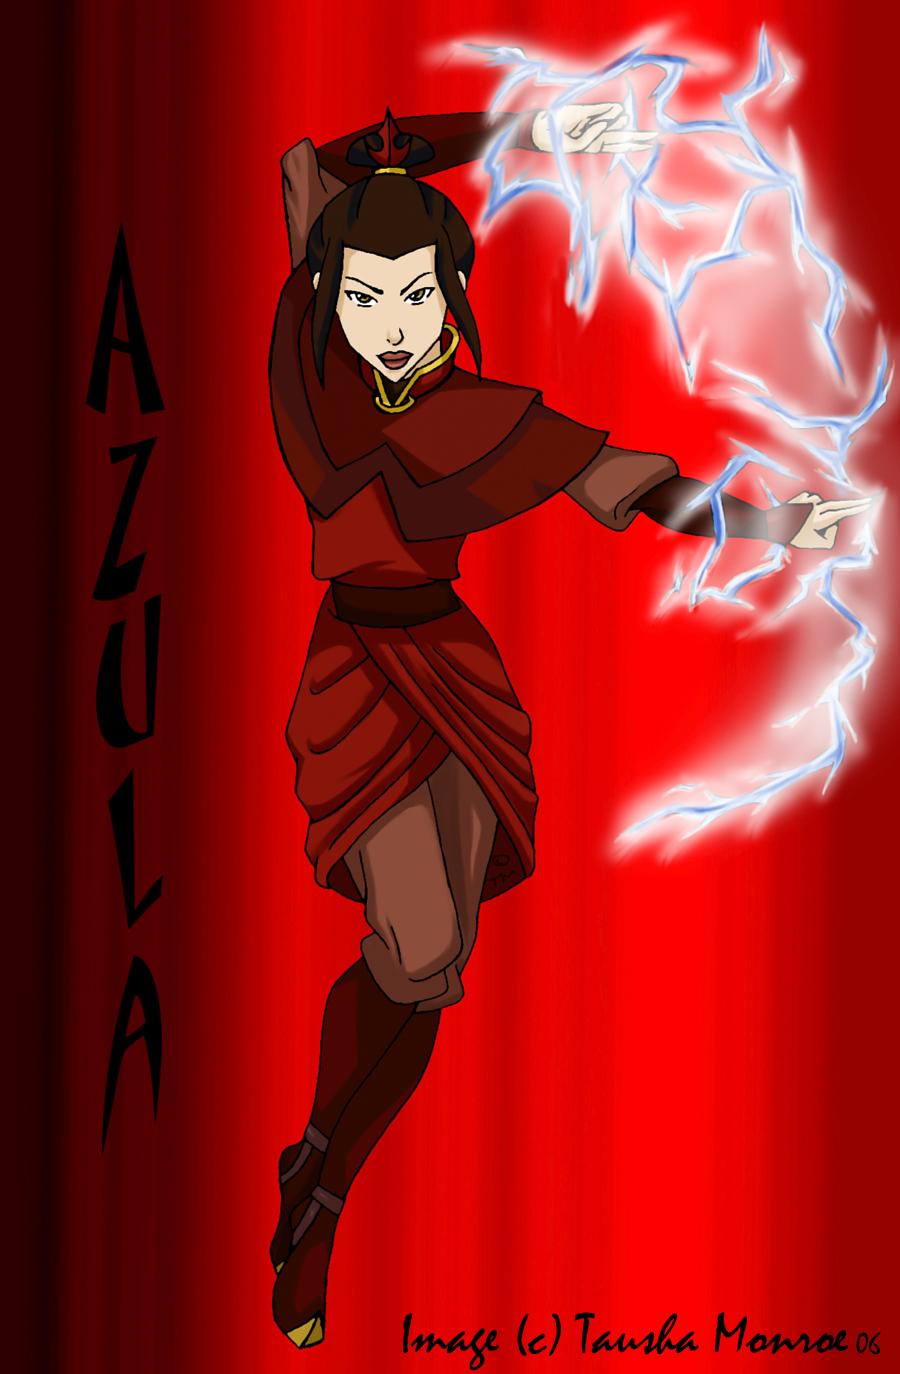 Avatar Azula Mai Ty Lee azuladahdtoudiazula-mai-ty-lee on deviantart